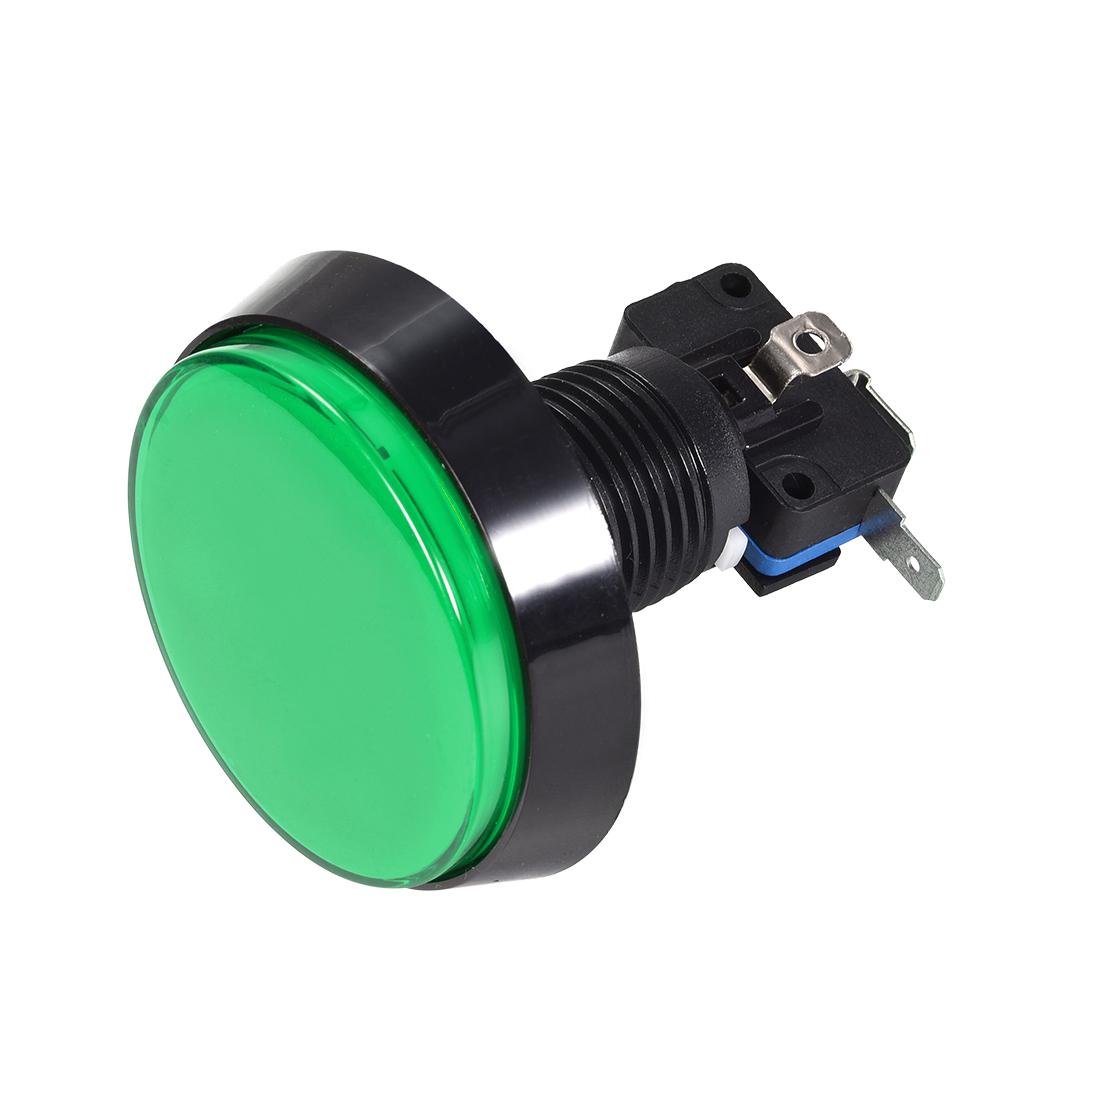 Game Push Button 60mm Round 12V LED Illuminated Push Button Switch Green 1pcs